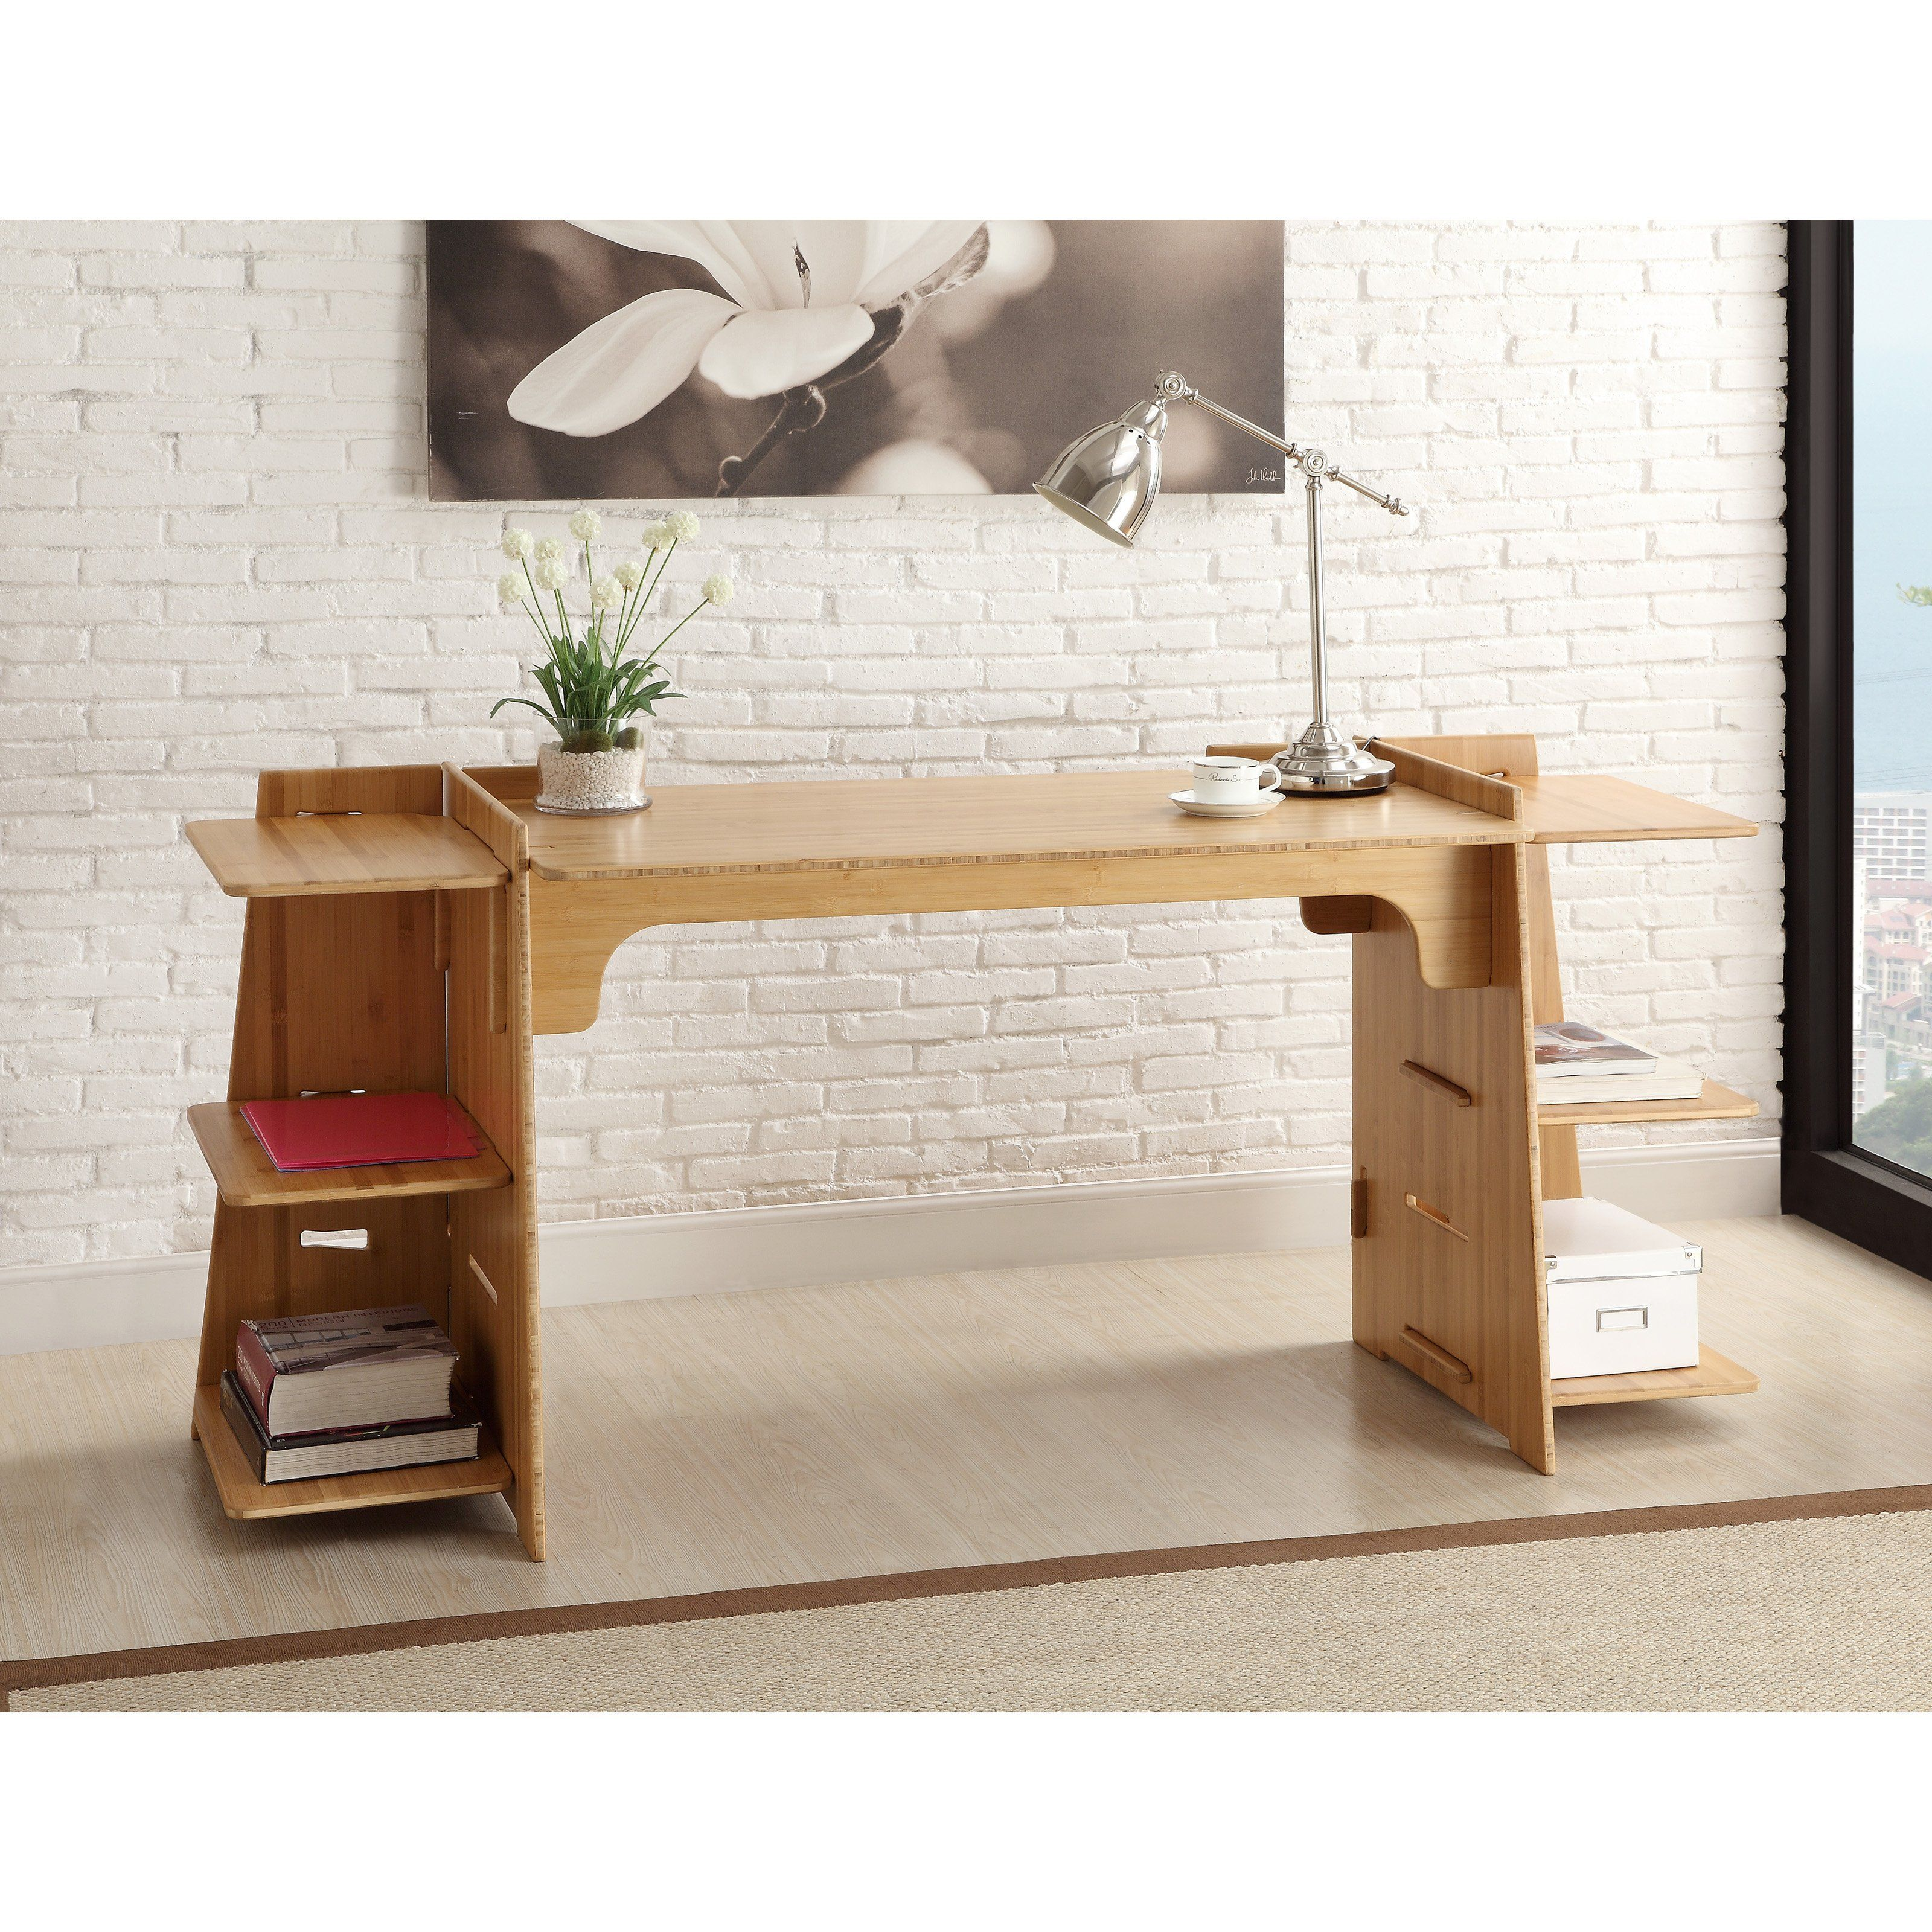 furniture-graphic-designer-desk-interior-office-furniture-lshaped-glass-amuzing-desk-wooden-laptop-with-marvellous-chic-metal-reading-images-designs-office-desk-design-cool-desk-designs-for-computer-o.jpg (3200×3200)